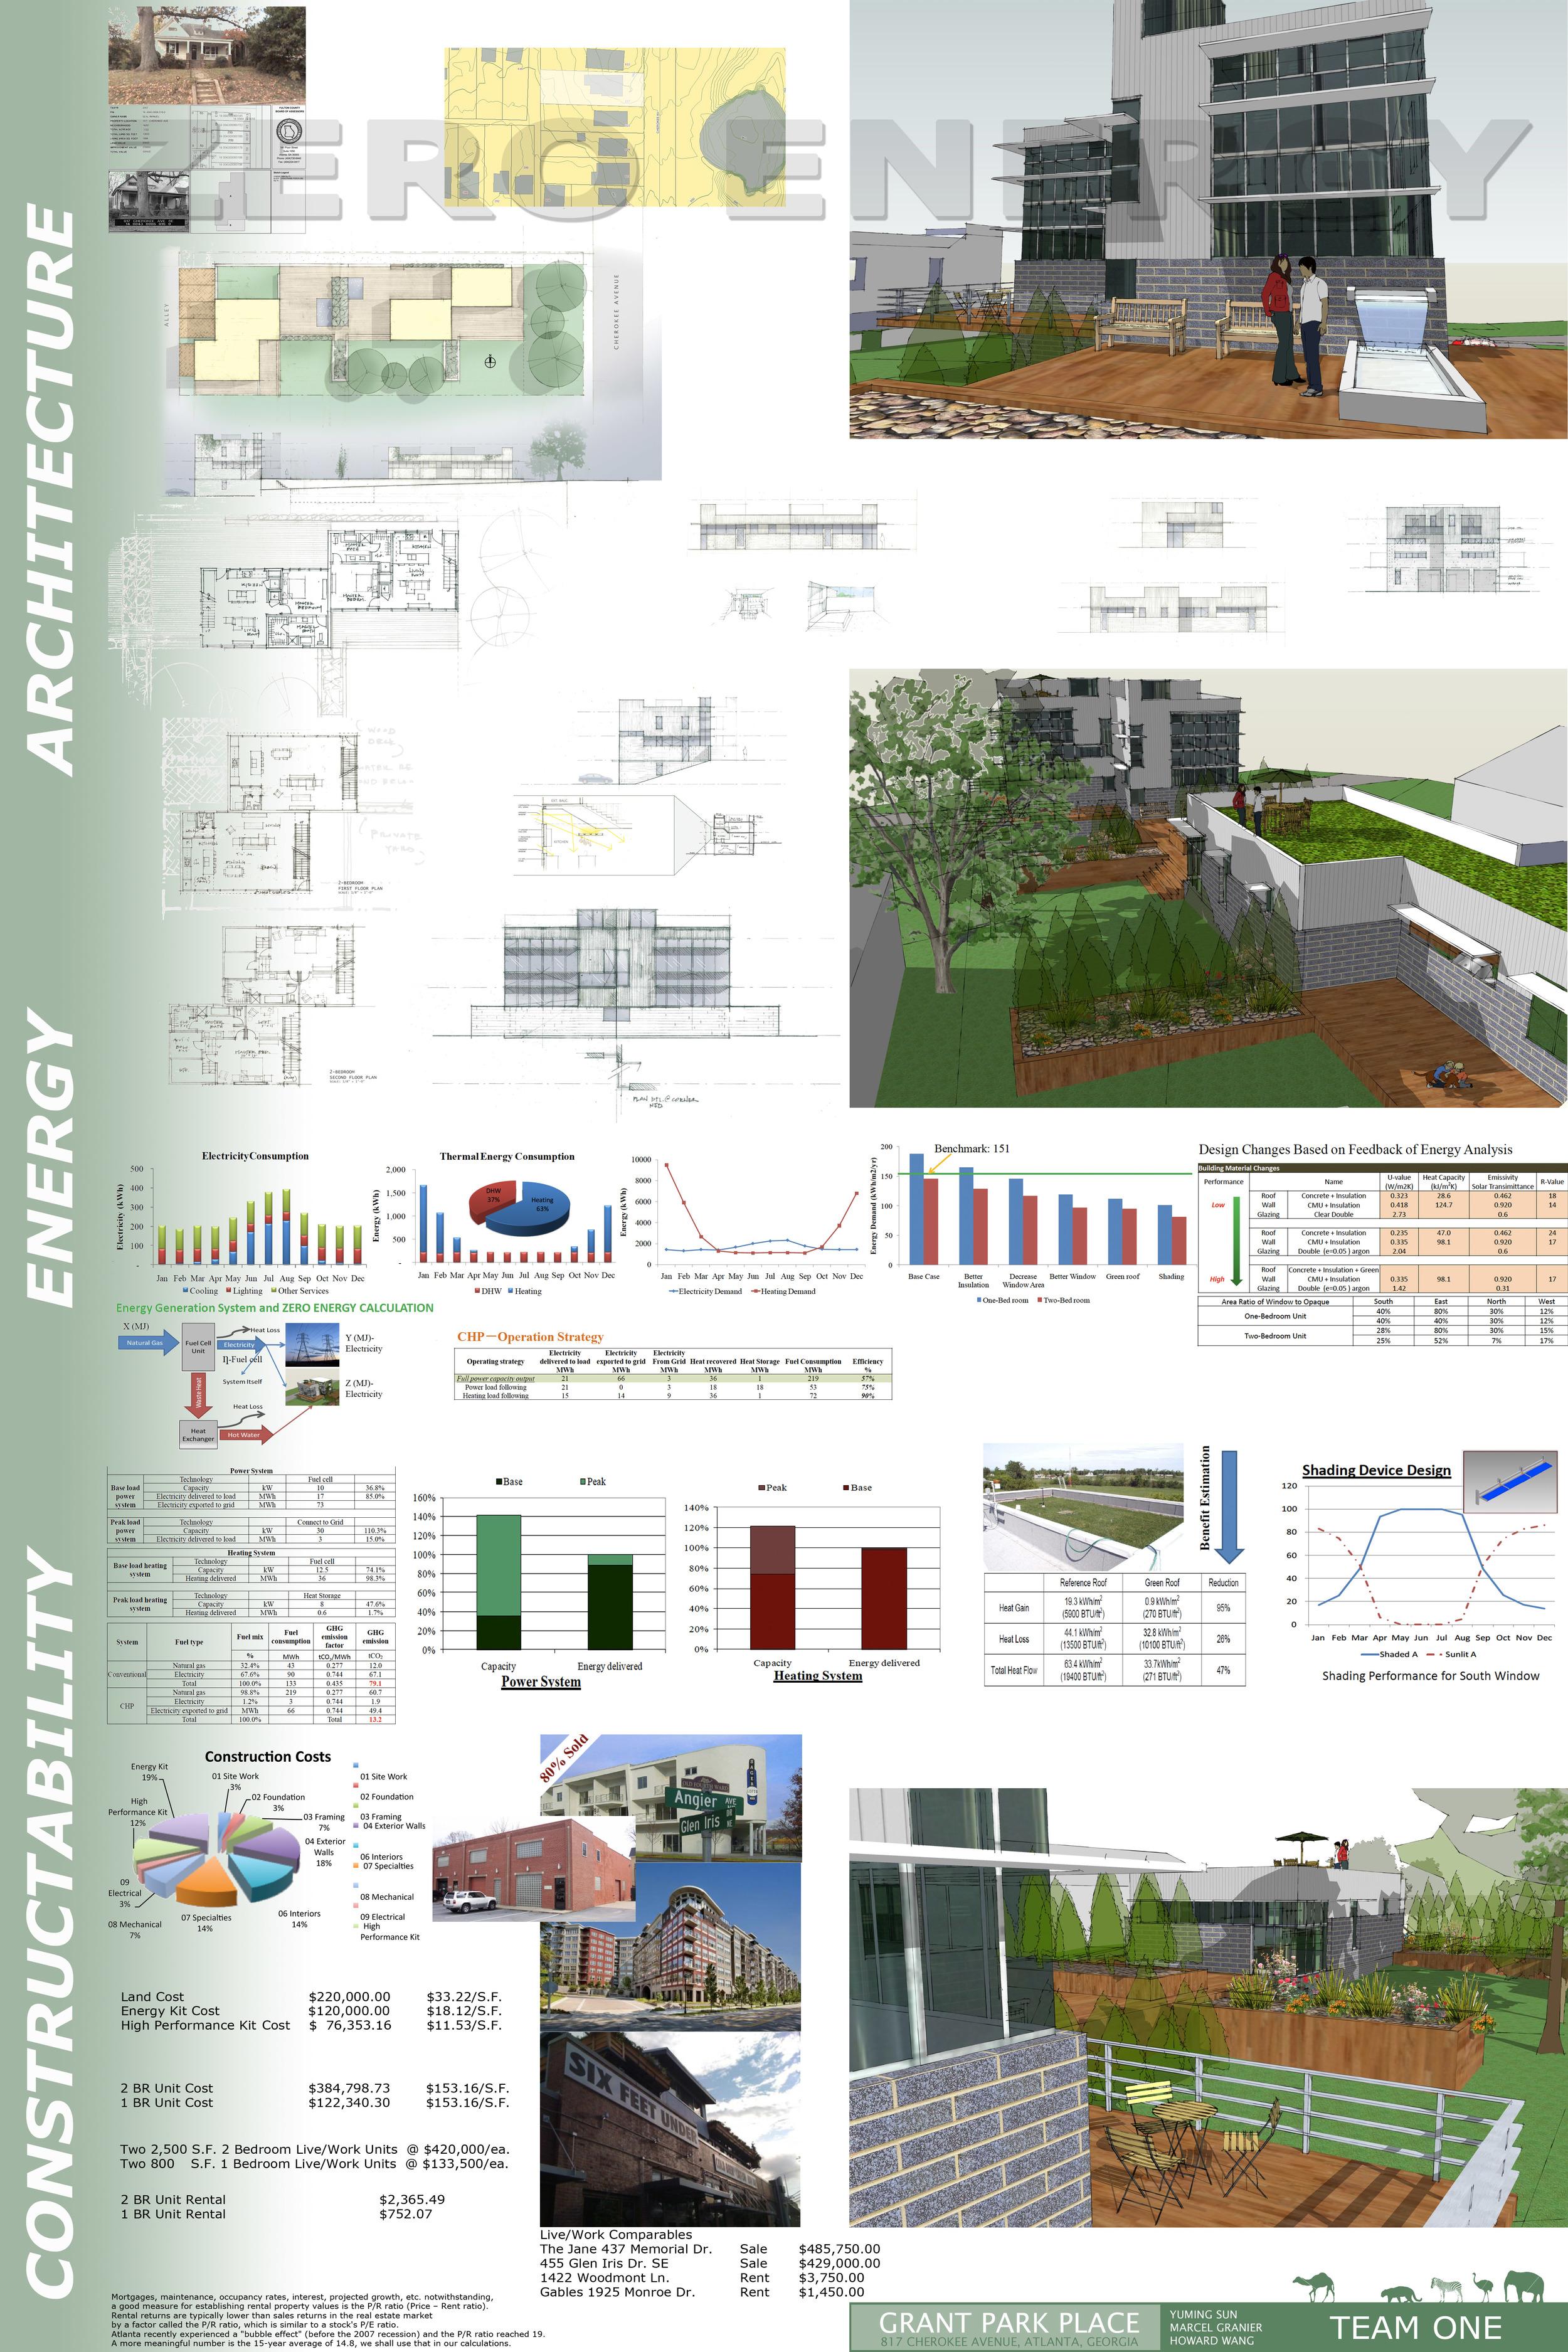 zedh image 4 acsa - Copy - Copy.jpg